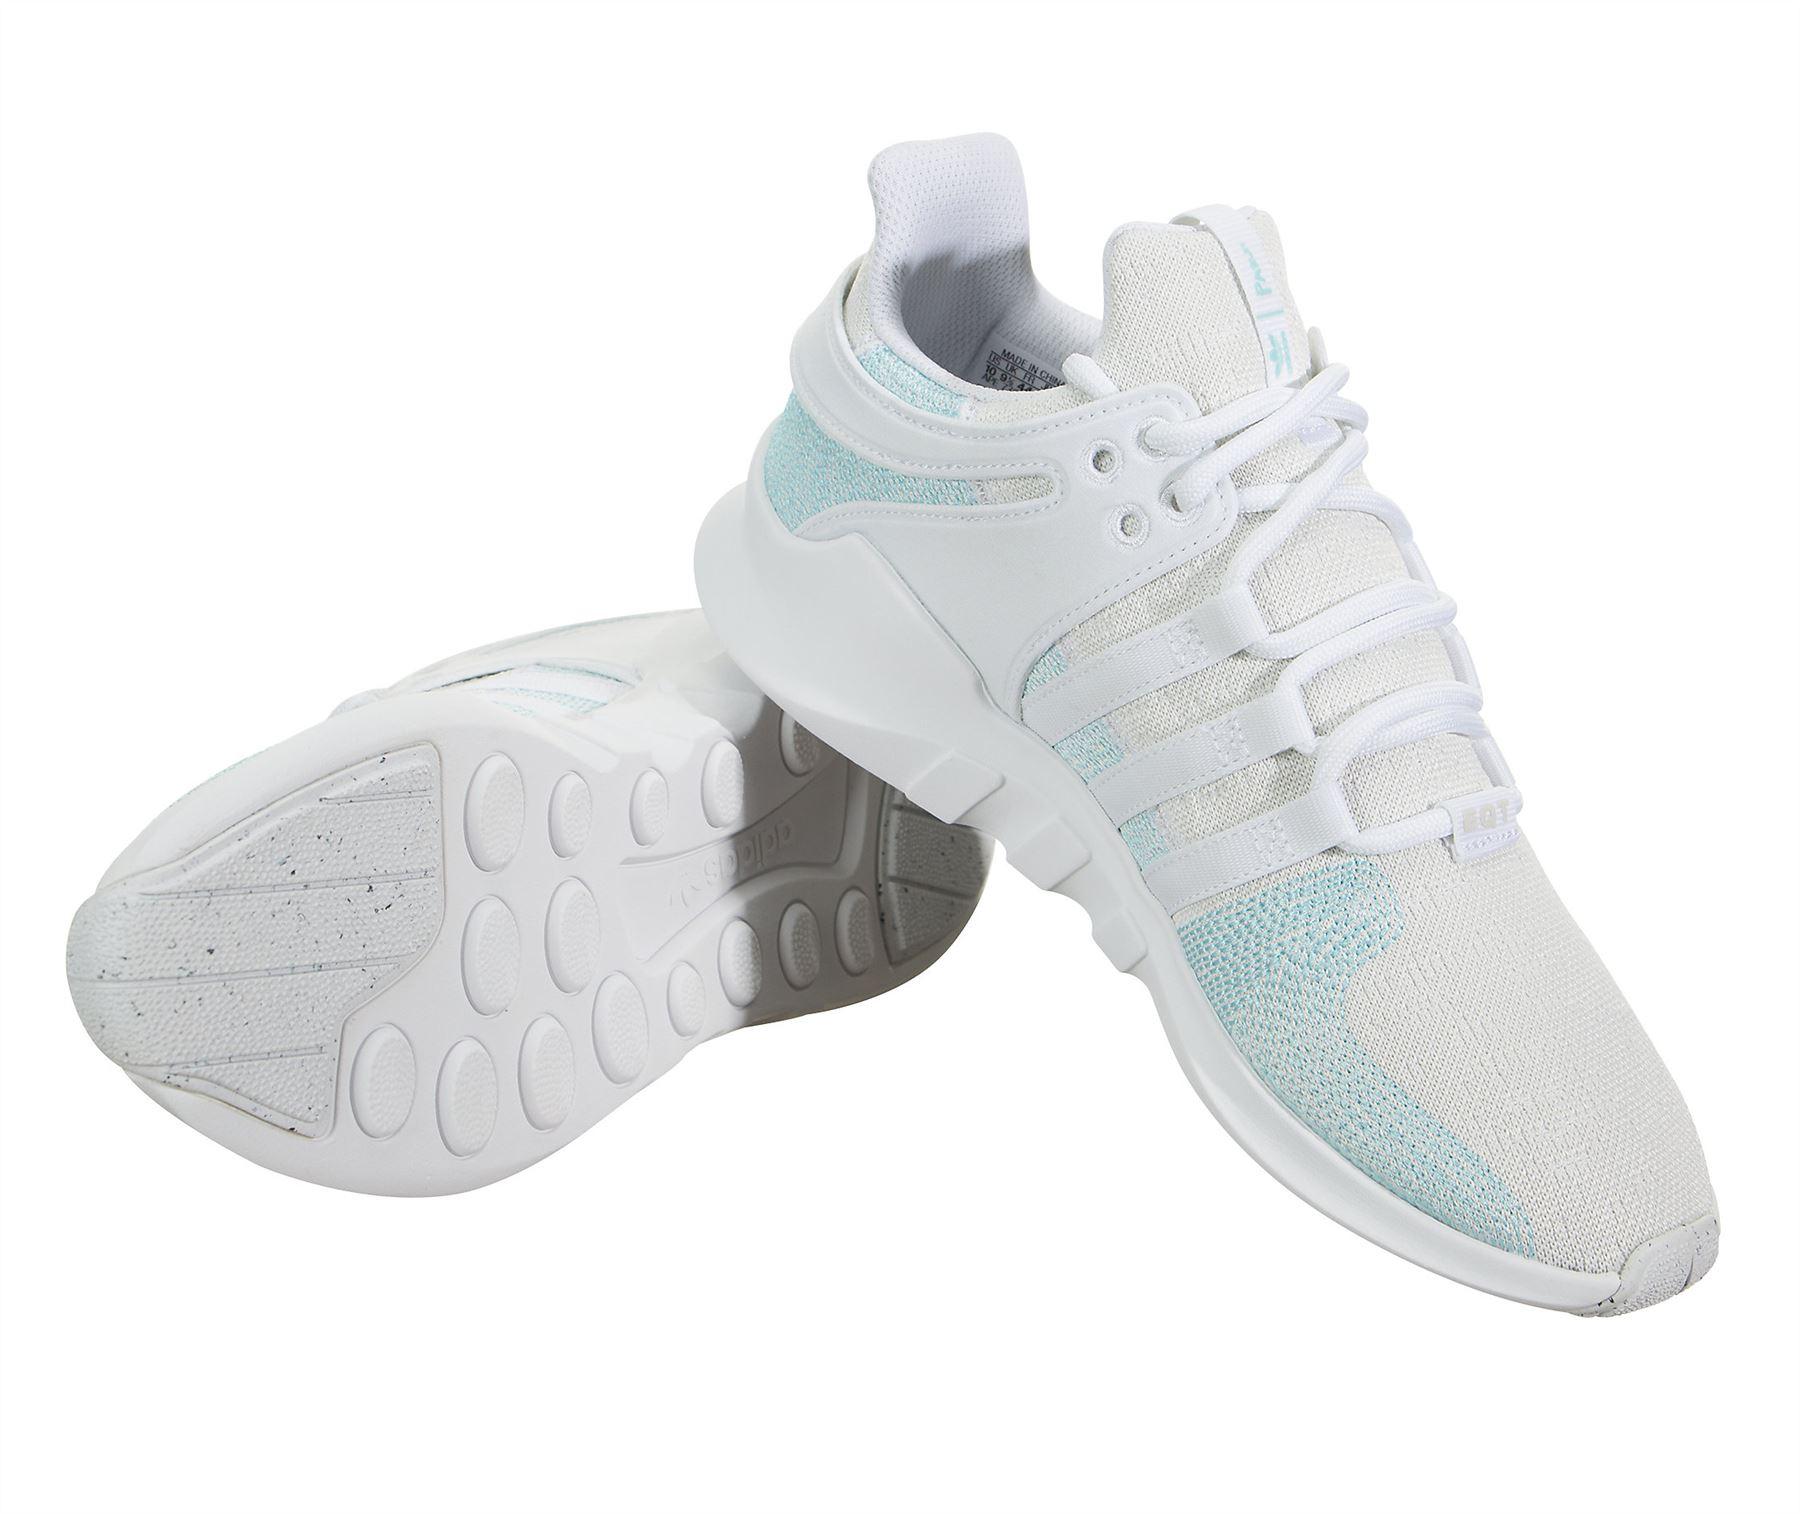 adidas-EQT-Support-ADV-Mens-Trainers-Originals-RRP-90-SAVE-039-S-MOST-SIZES miniatuur 3